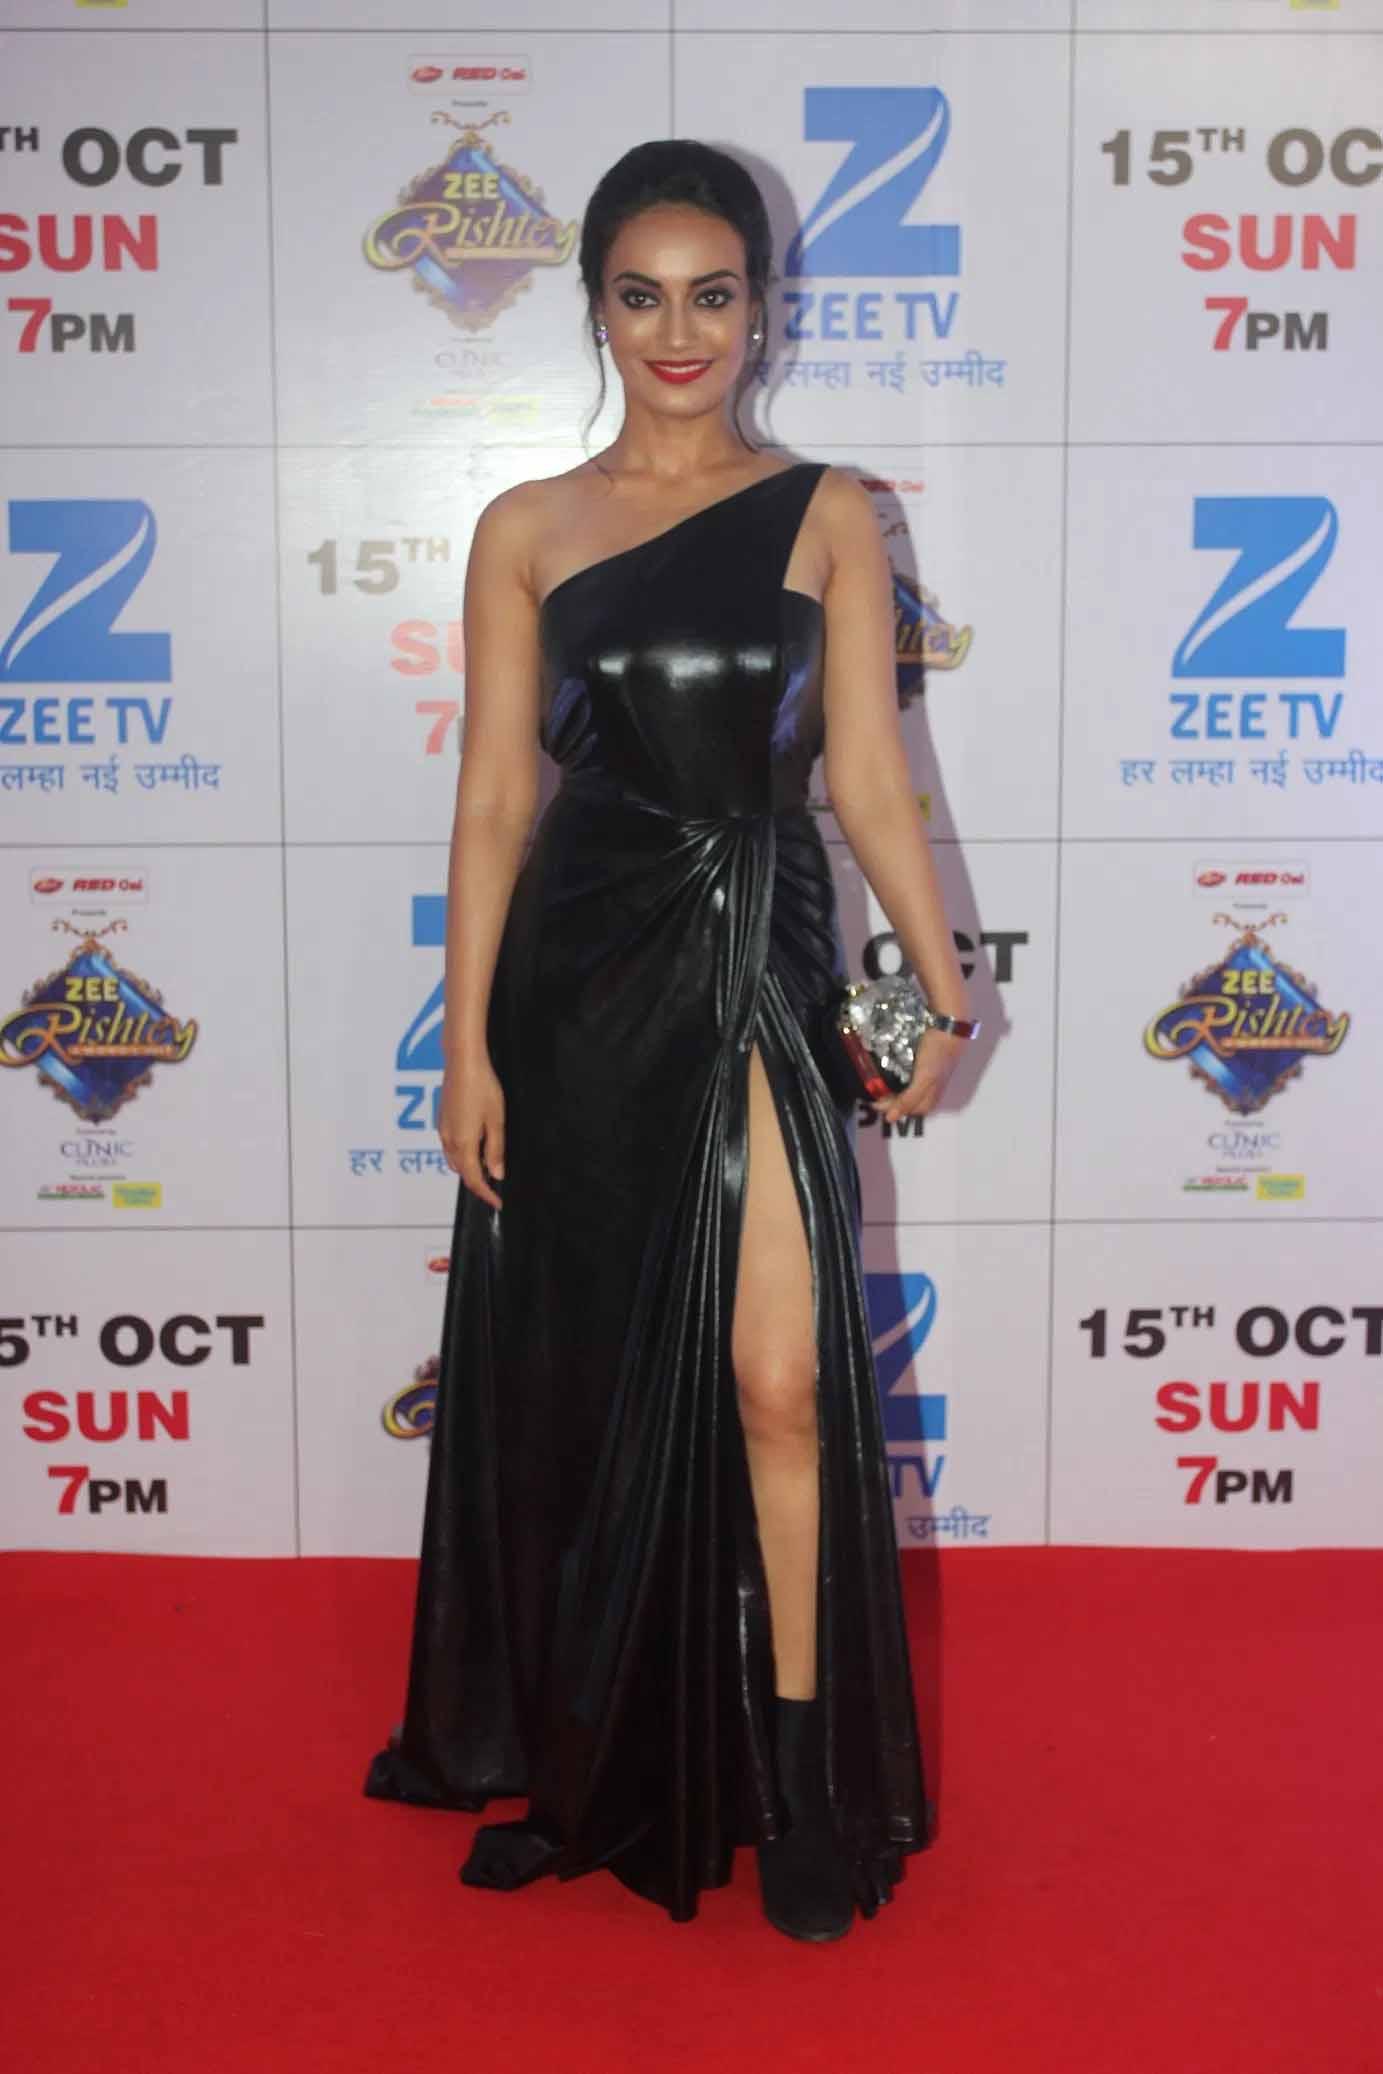 Shivangi Joshi VS Surbhi Jyoti: The Queen of Red Carpet?